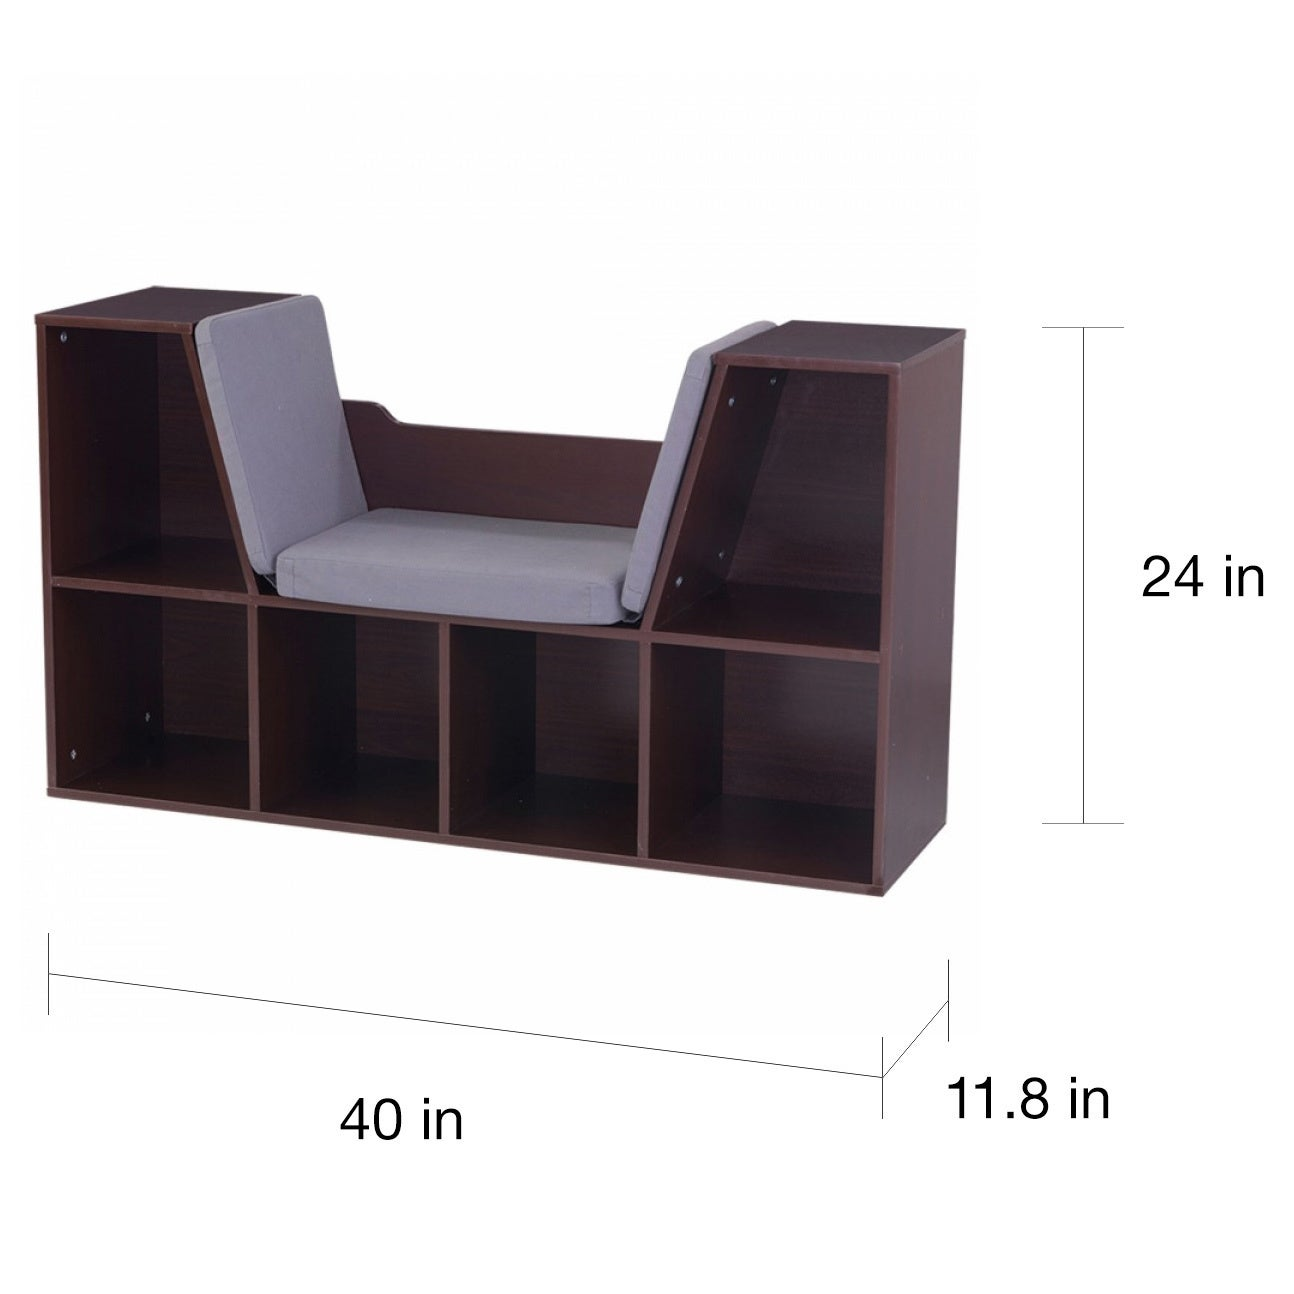 Espresso Brown Kids Bookcase Storage With Reading Nook Grey Cushion Bench Seat 706943142318 Ebay